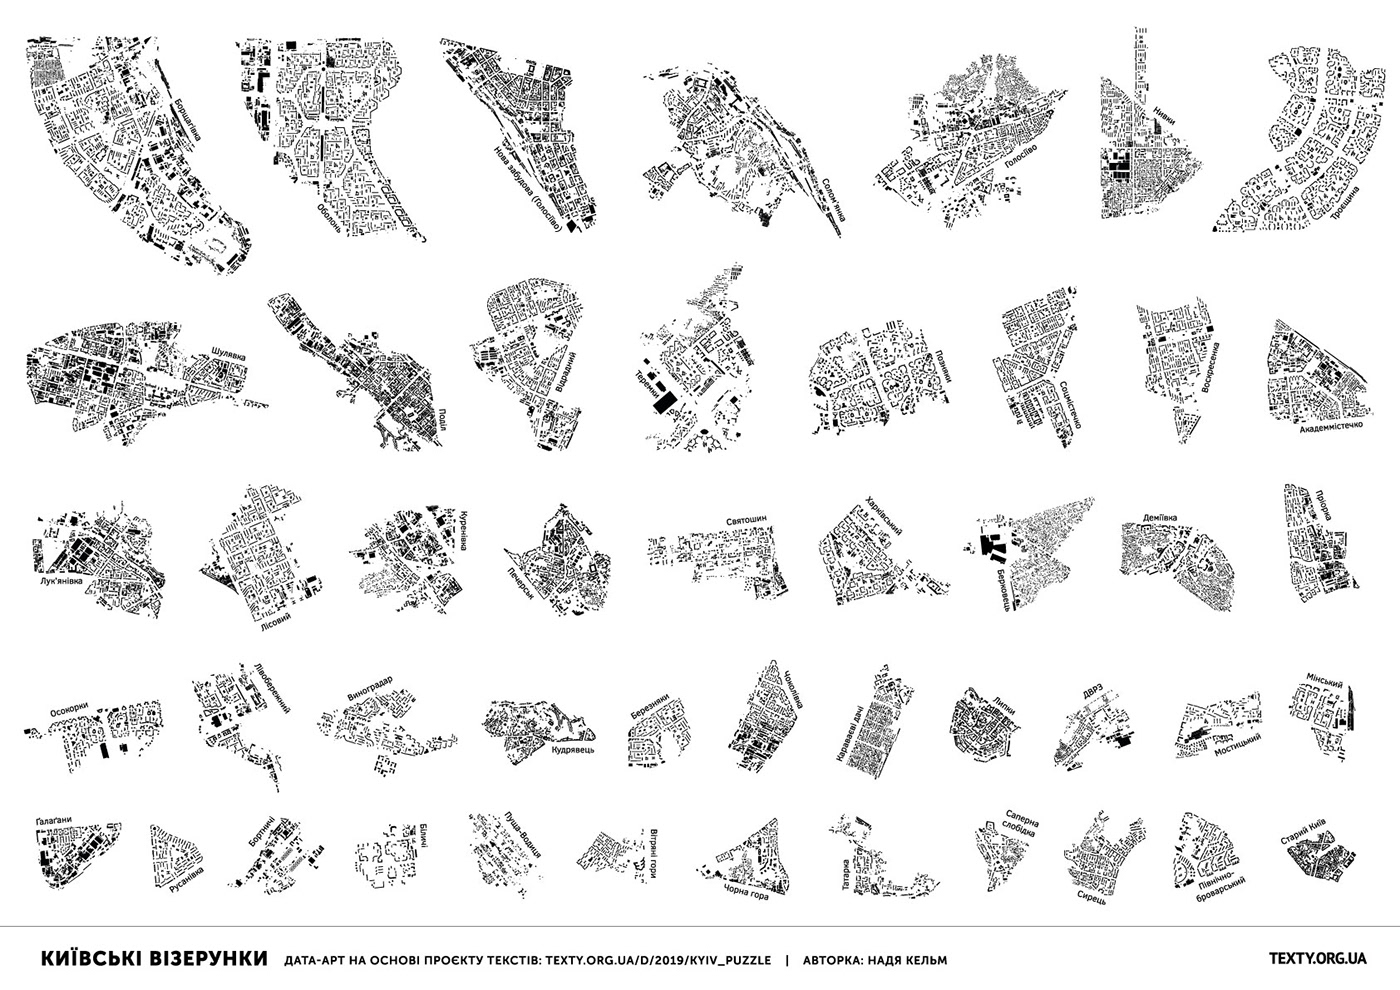 city dataart datajournalism Graphs infographic InfoViz joyploy mapdesign Urban visualization